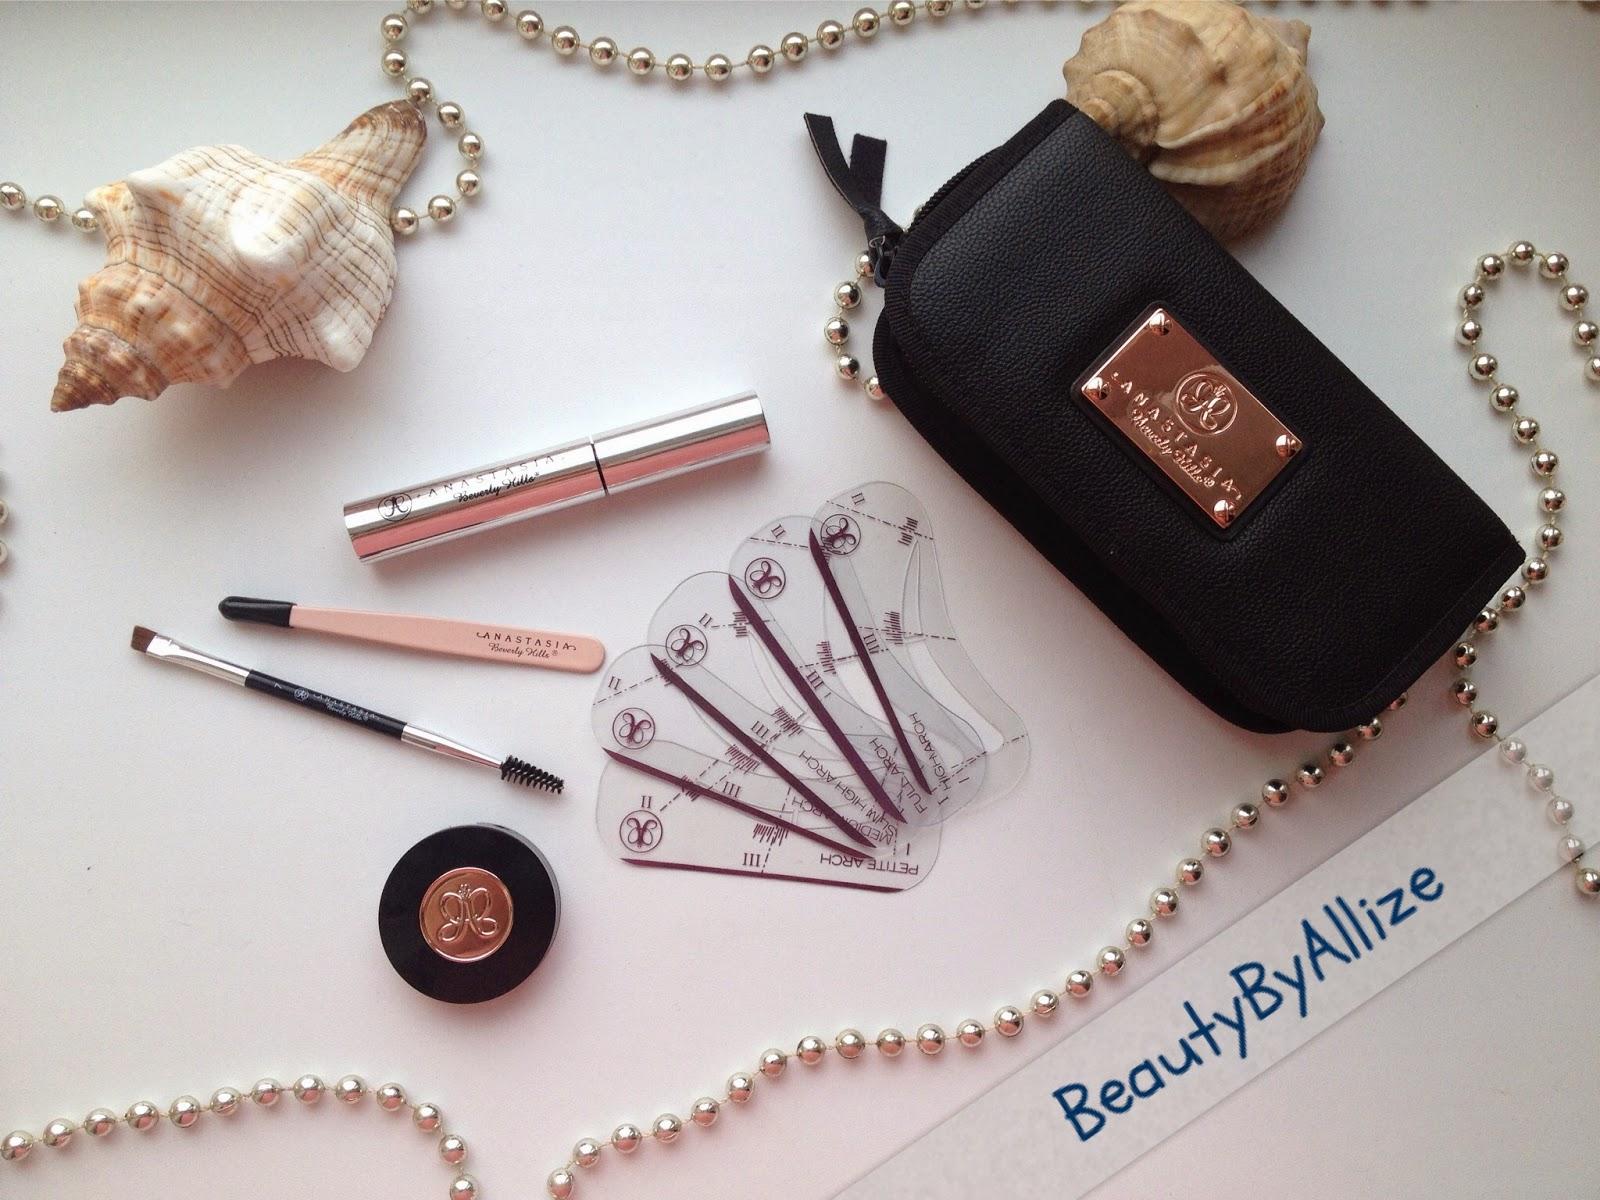 Anastasia Beverly Hills Brow Kit.